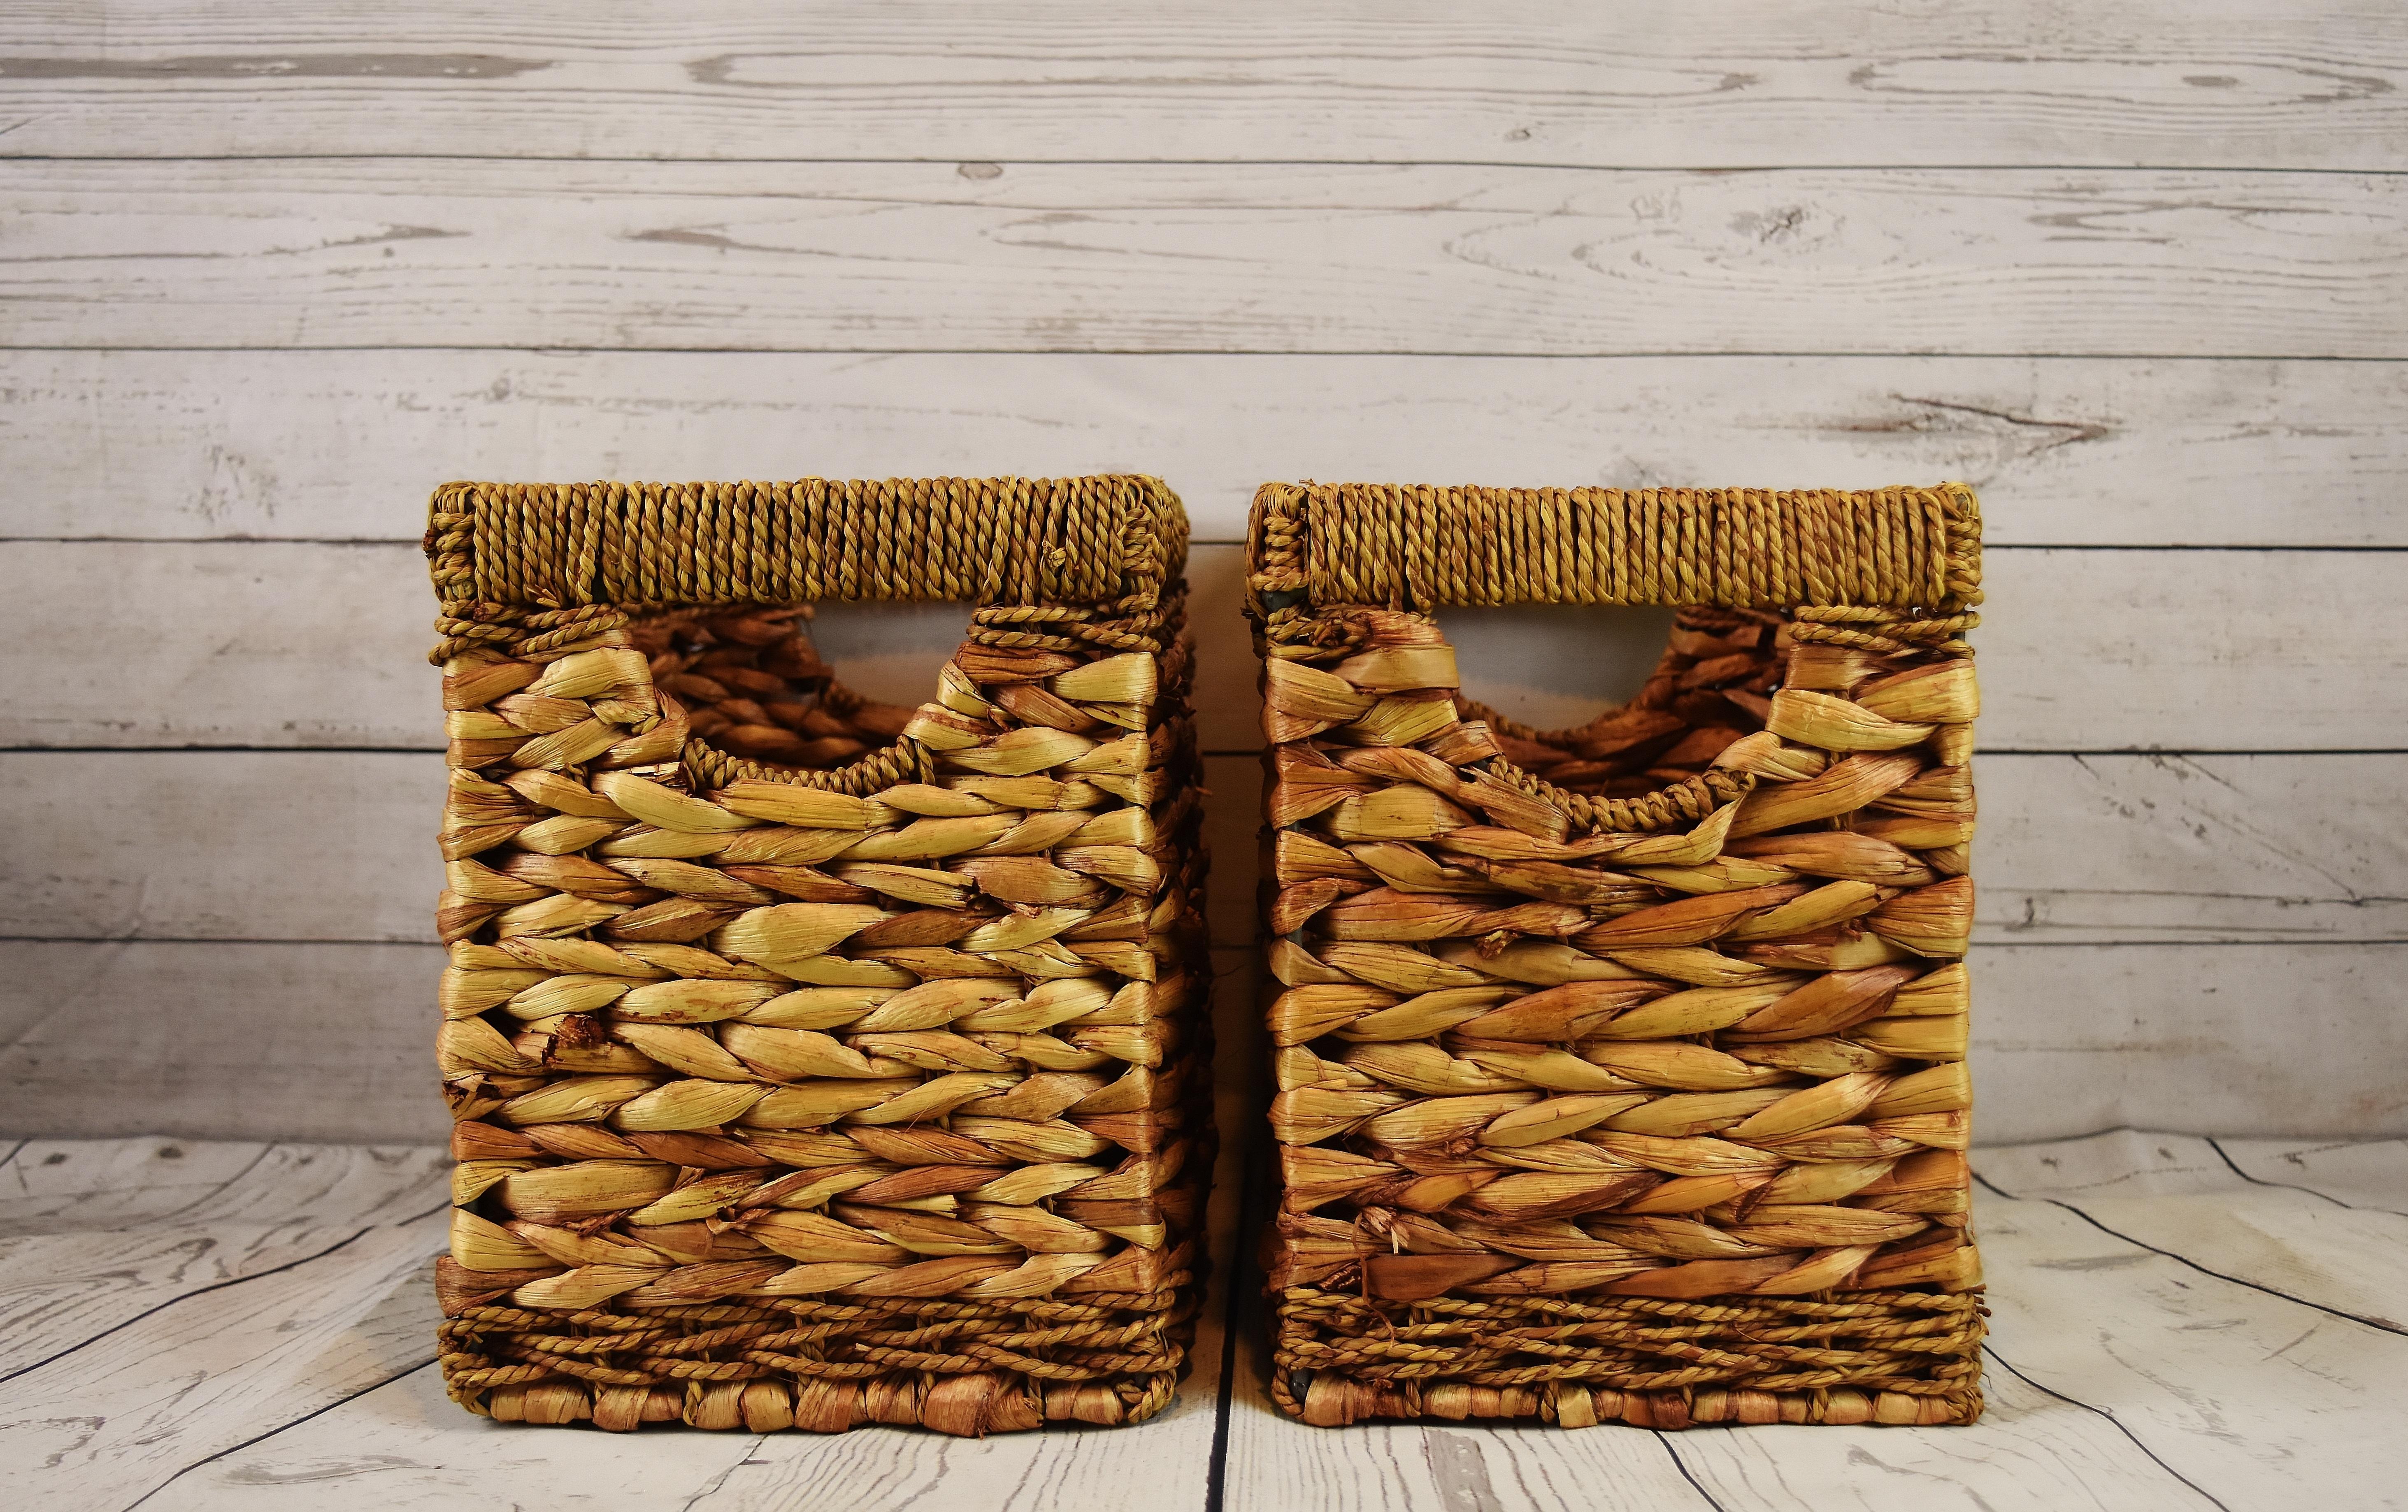 madera comida produce marrn mueble cesta mimbre cestas producto natural jacinto de agua objeto hecho